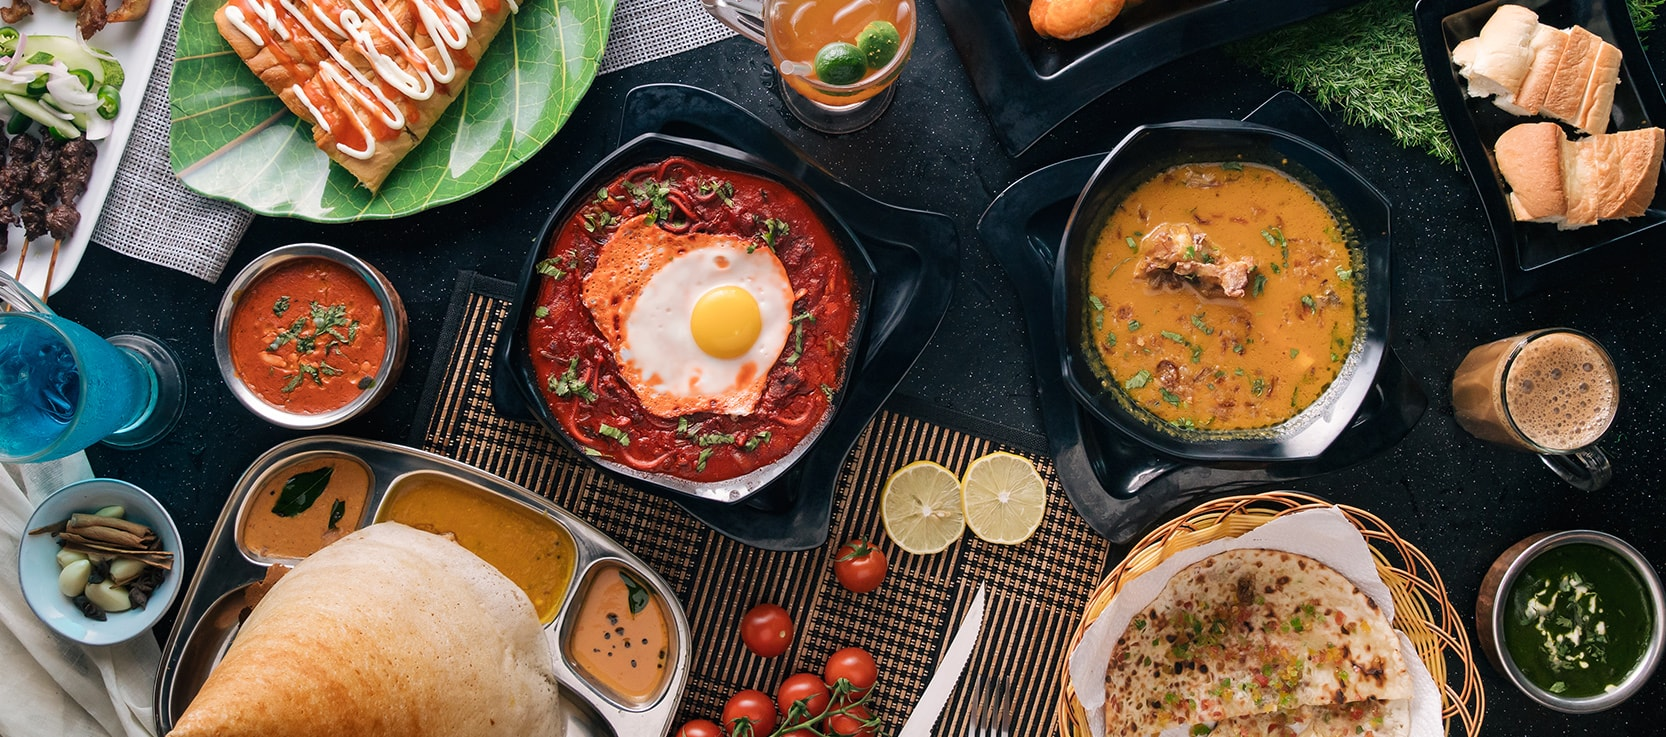 squarerooms-srisun-express-indian-food-flatlay-prata-egg-curry